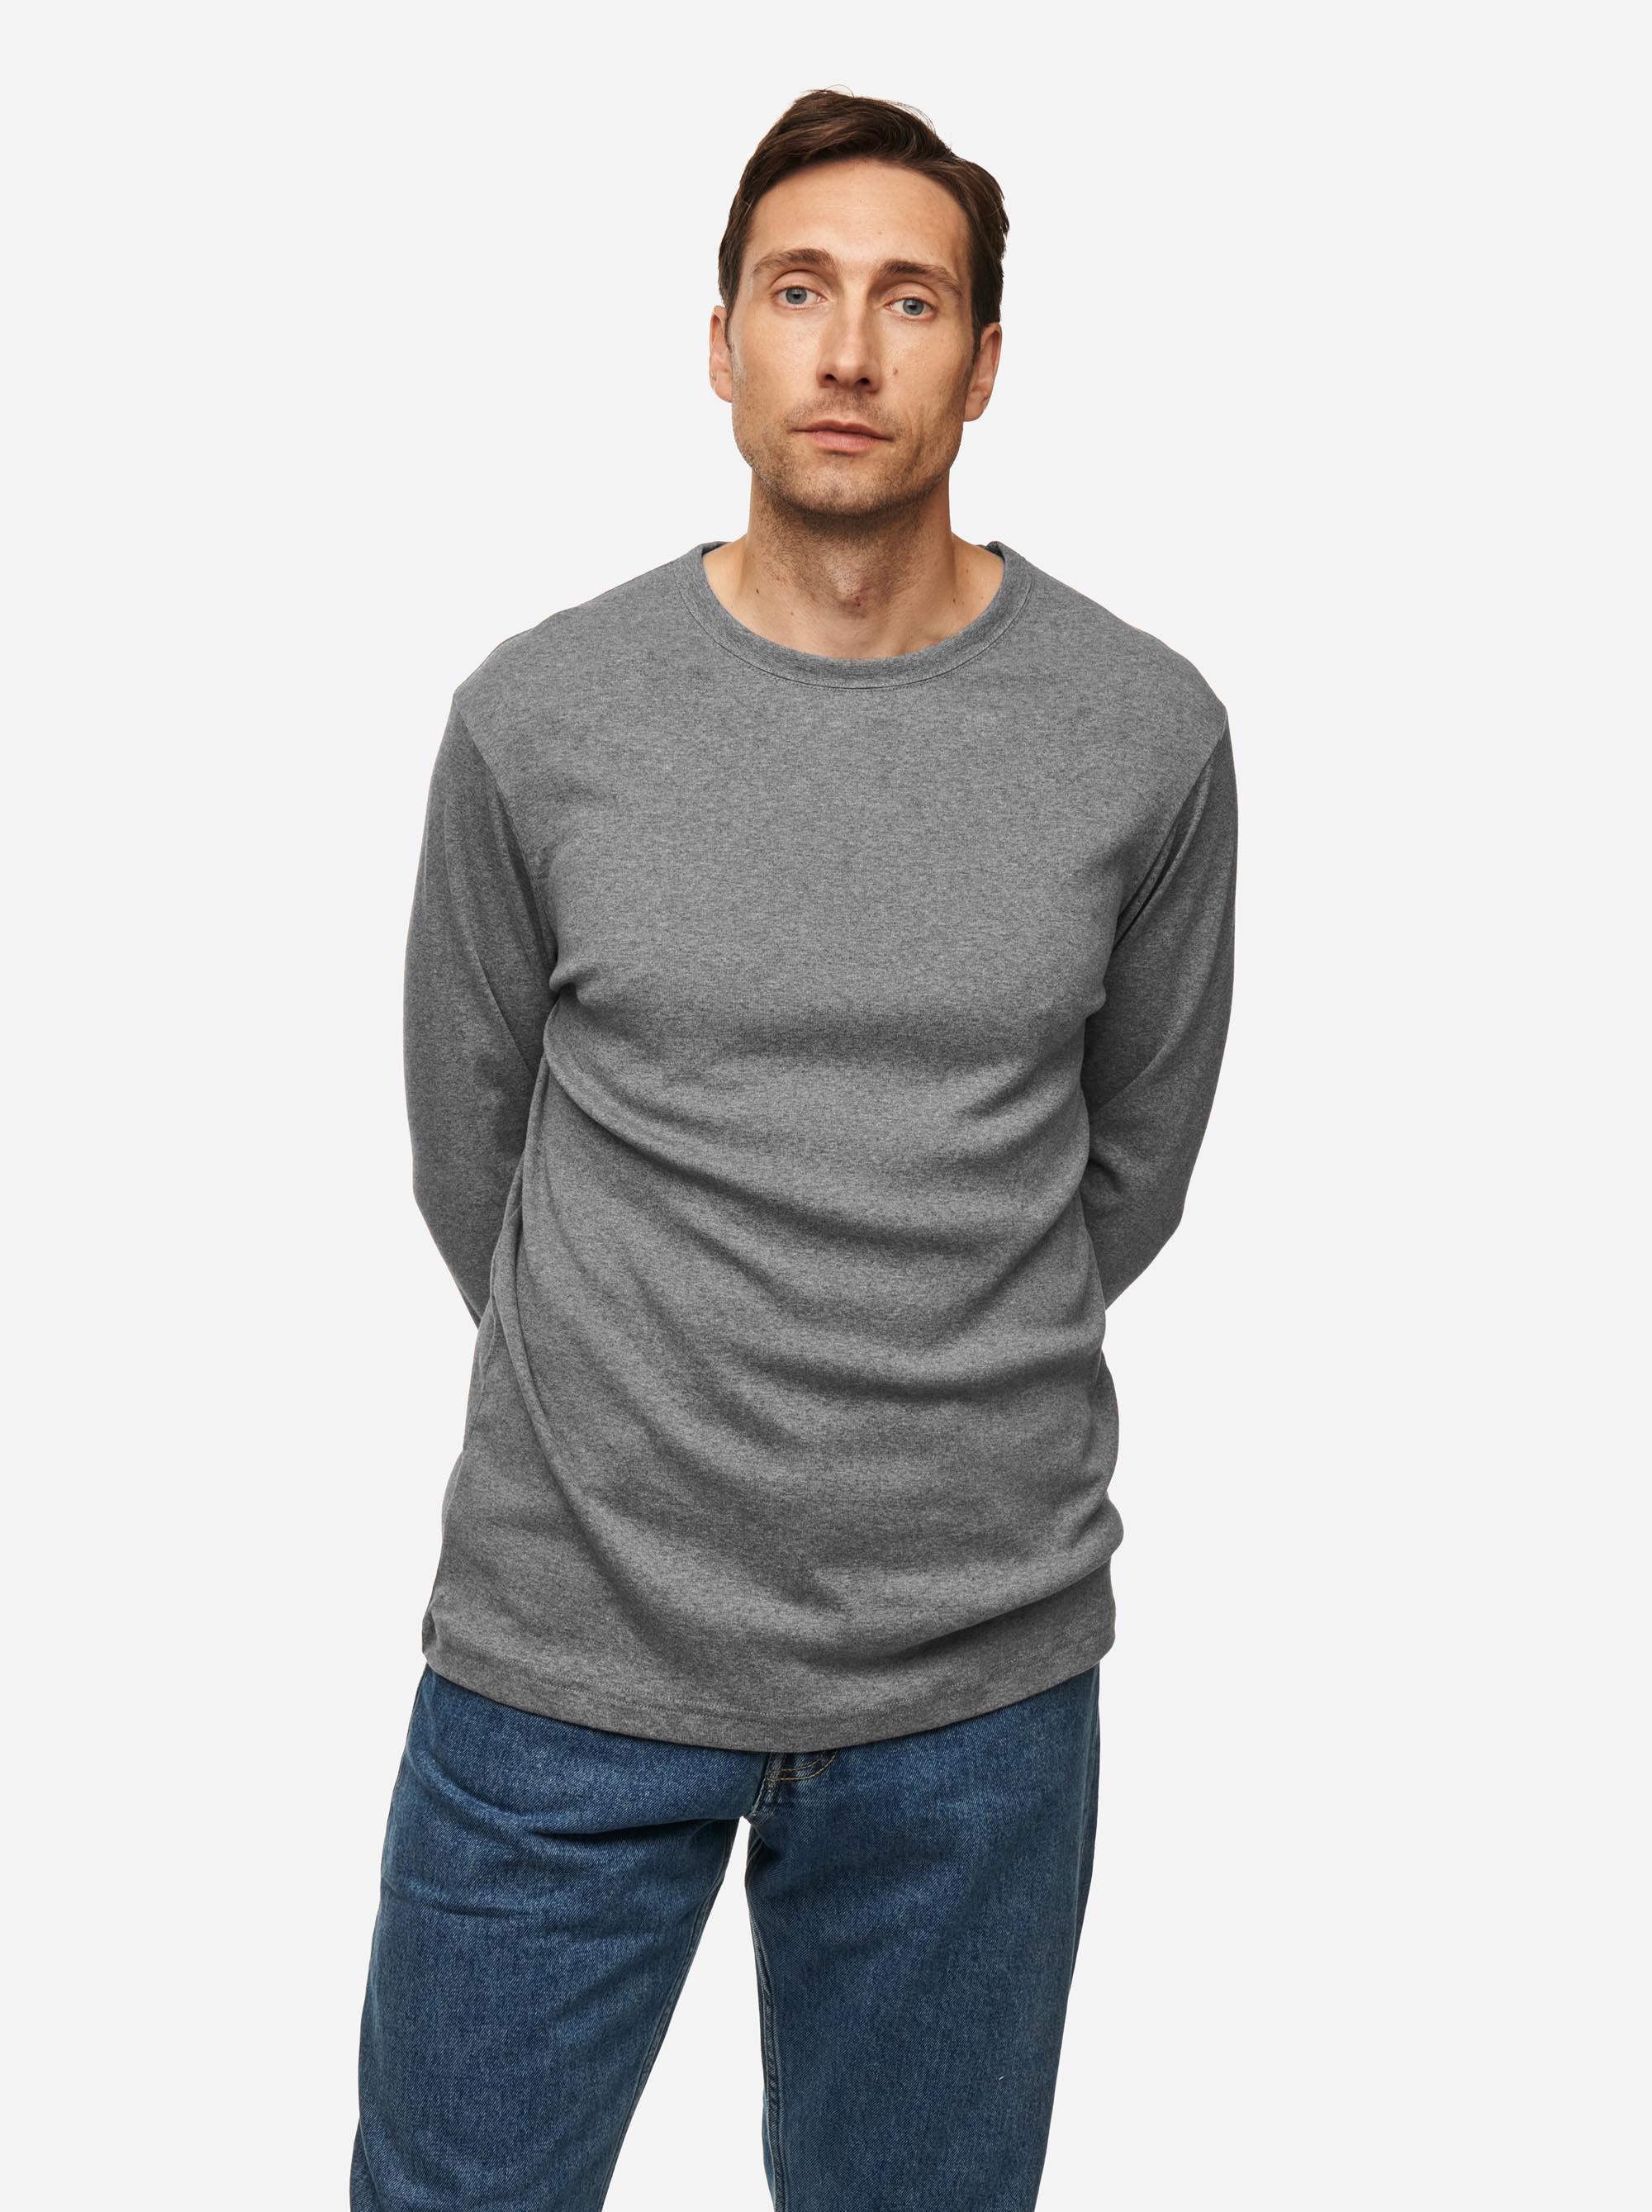 Teym - The-T-Shirt - Longsleeve - Men - Melange Grey - 2B